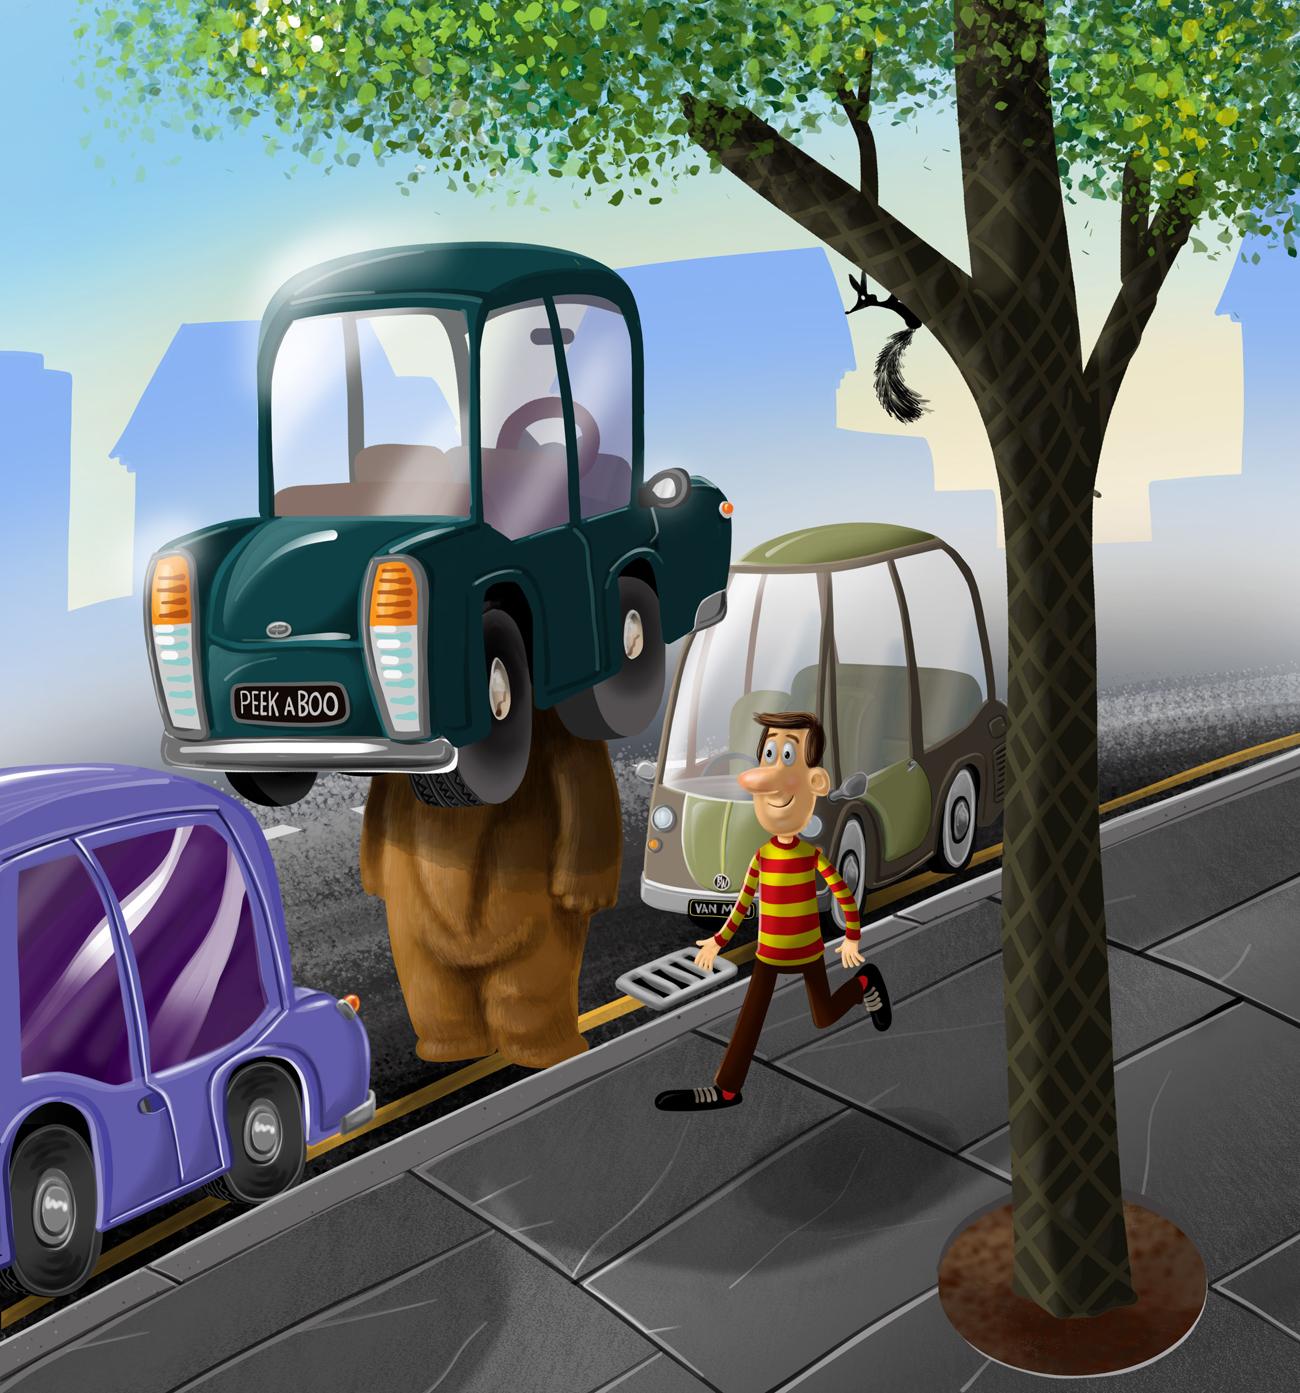 Bear hiding under a car illustration